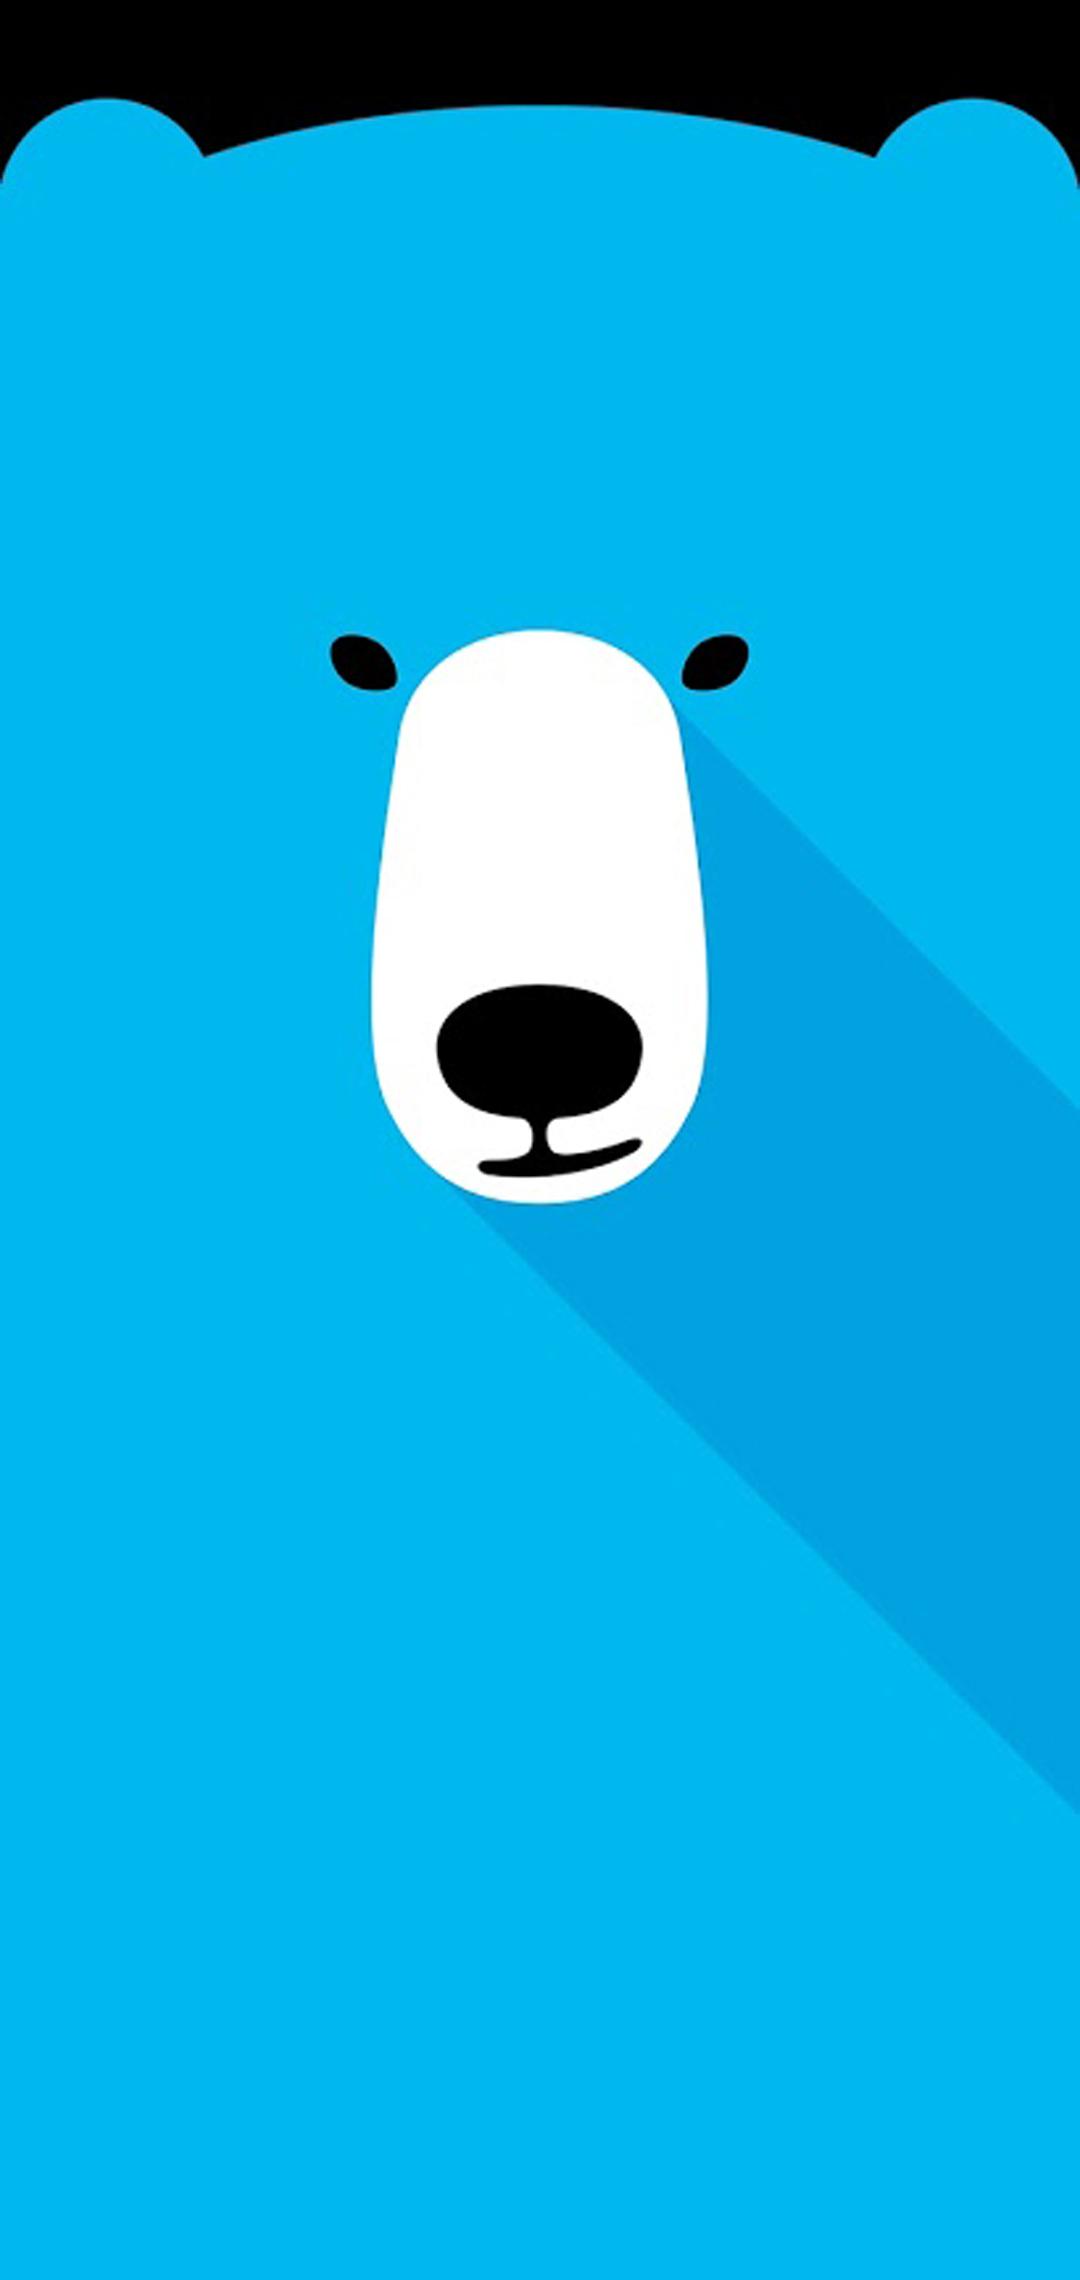 polar bear hole-punch wallpaper